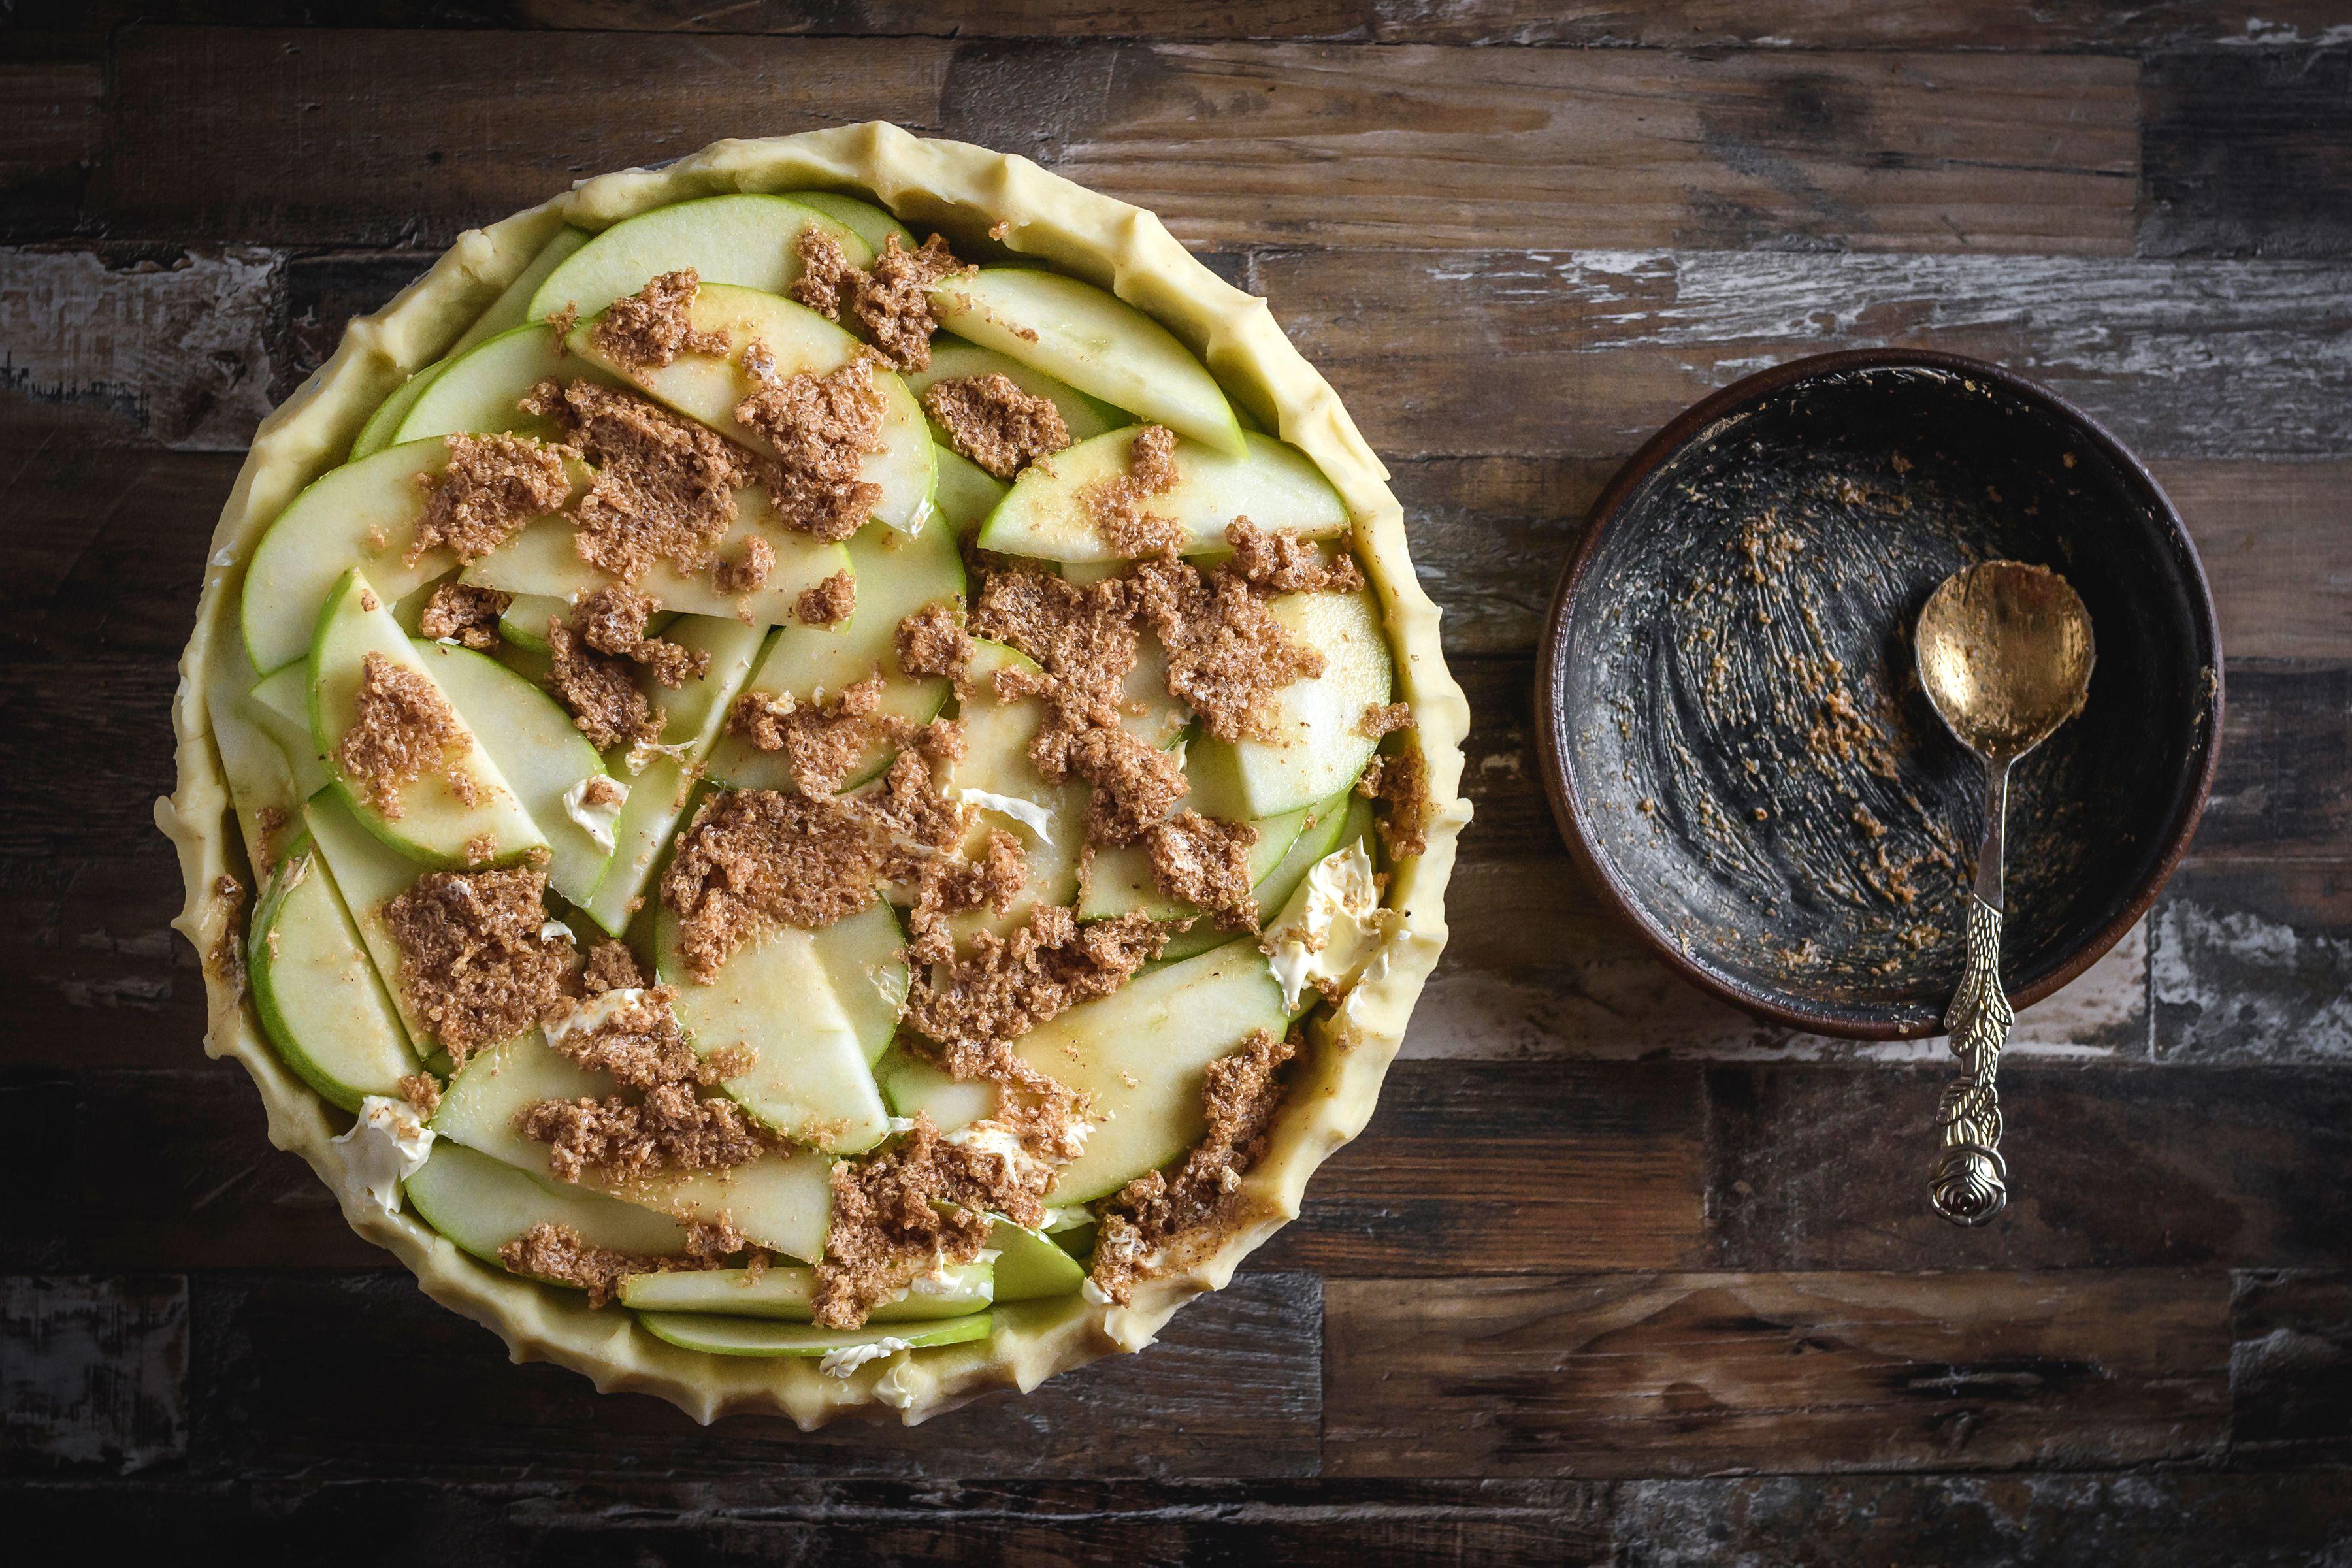 Crumble sugar mixture over pie